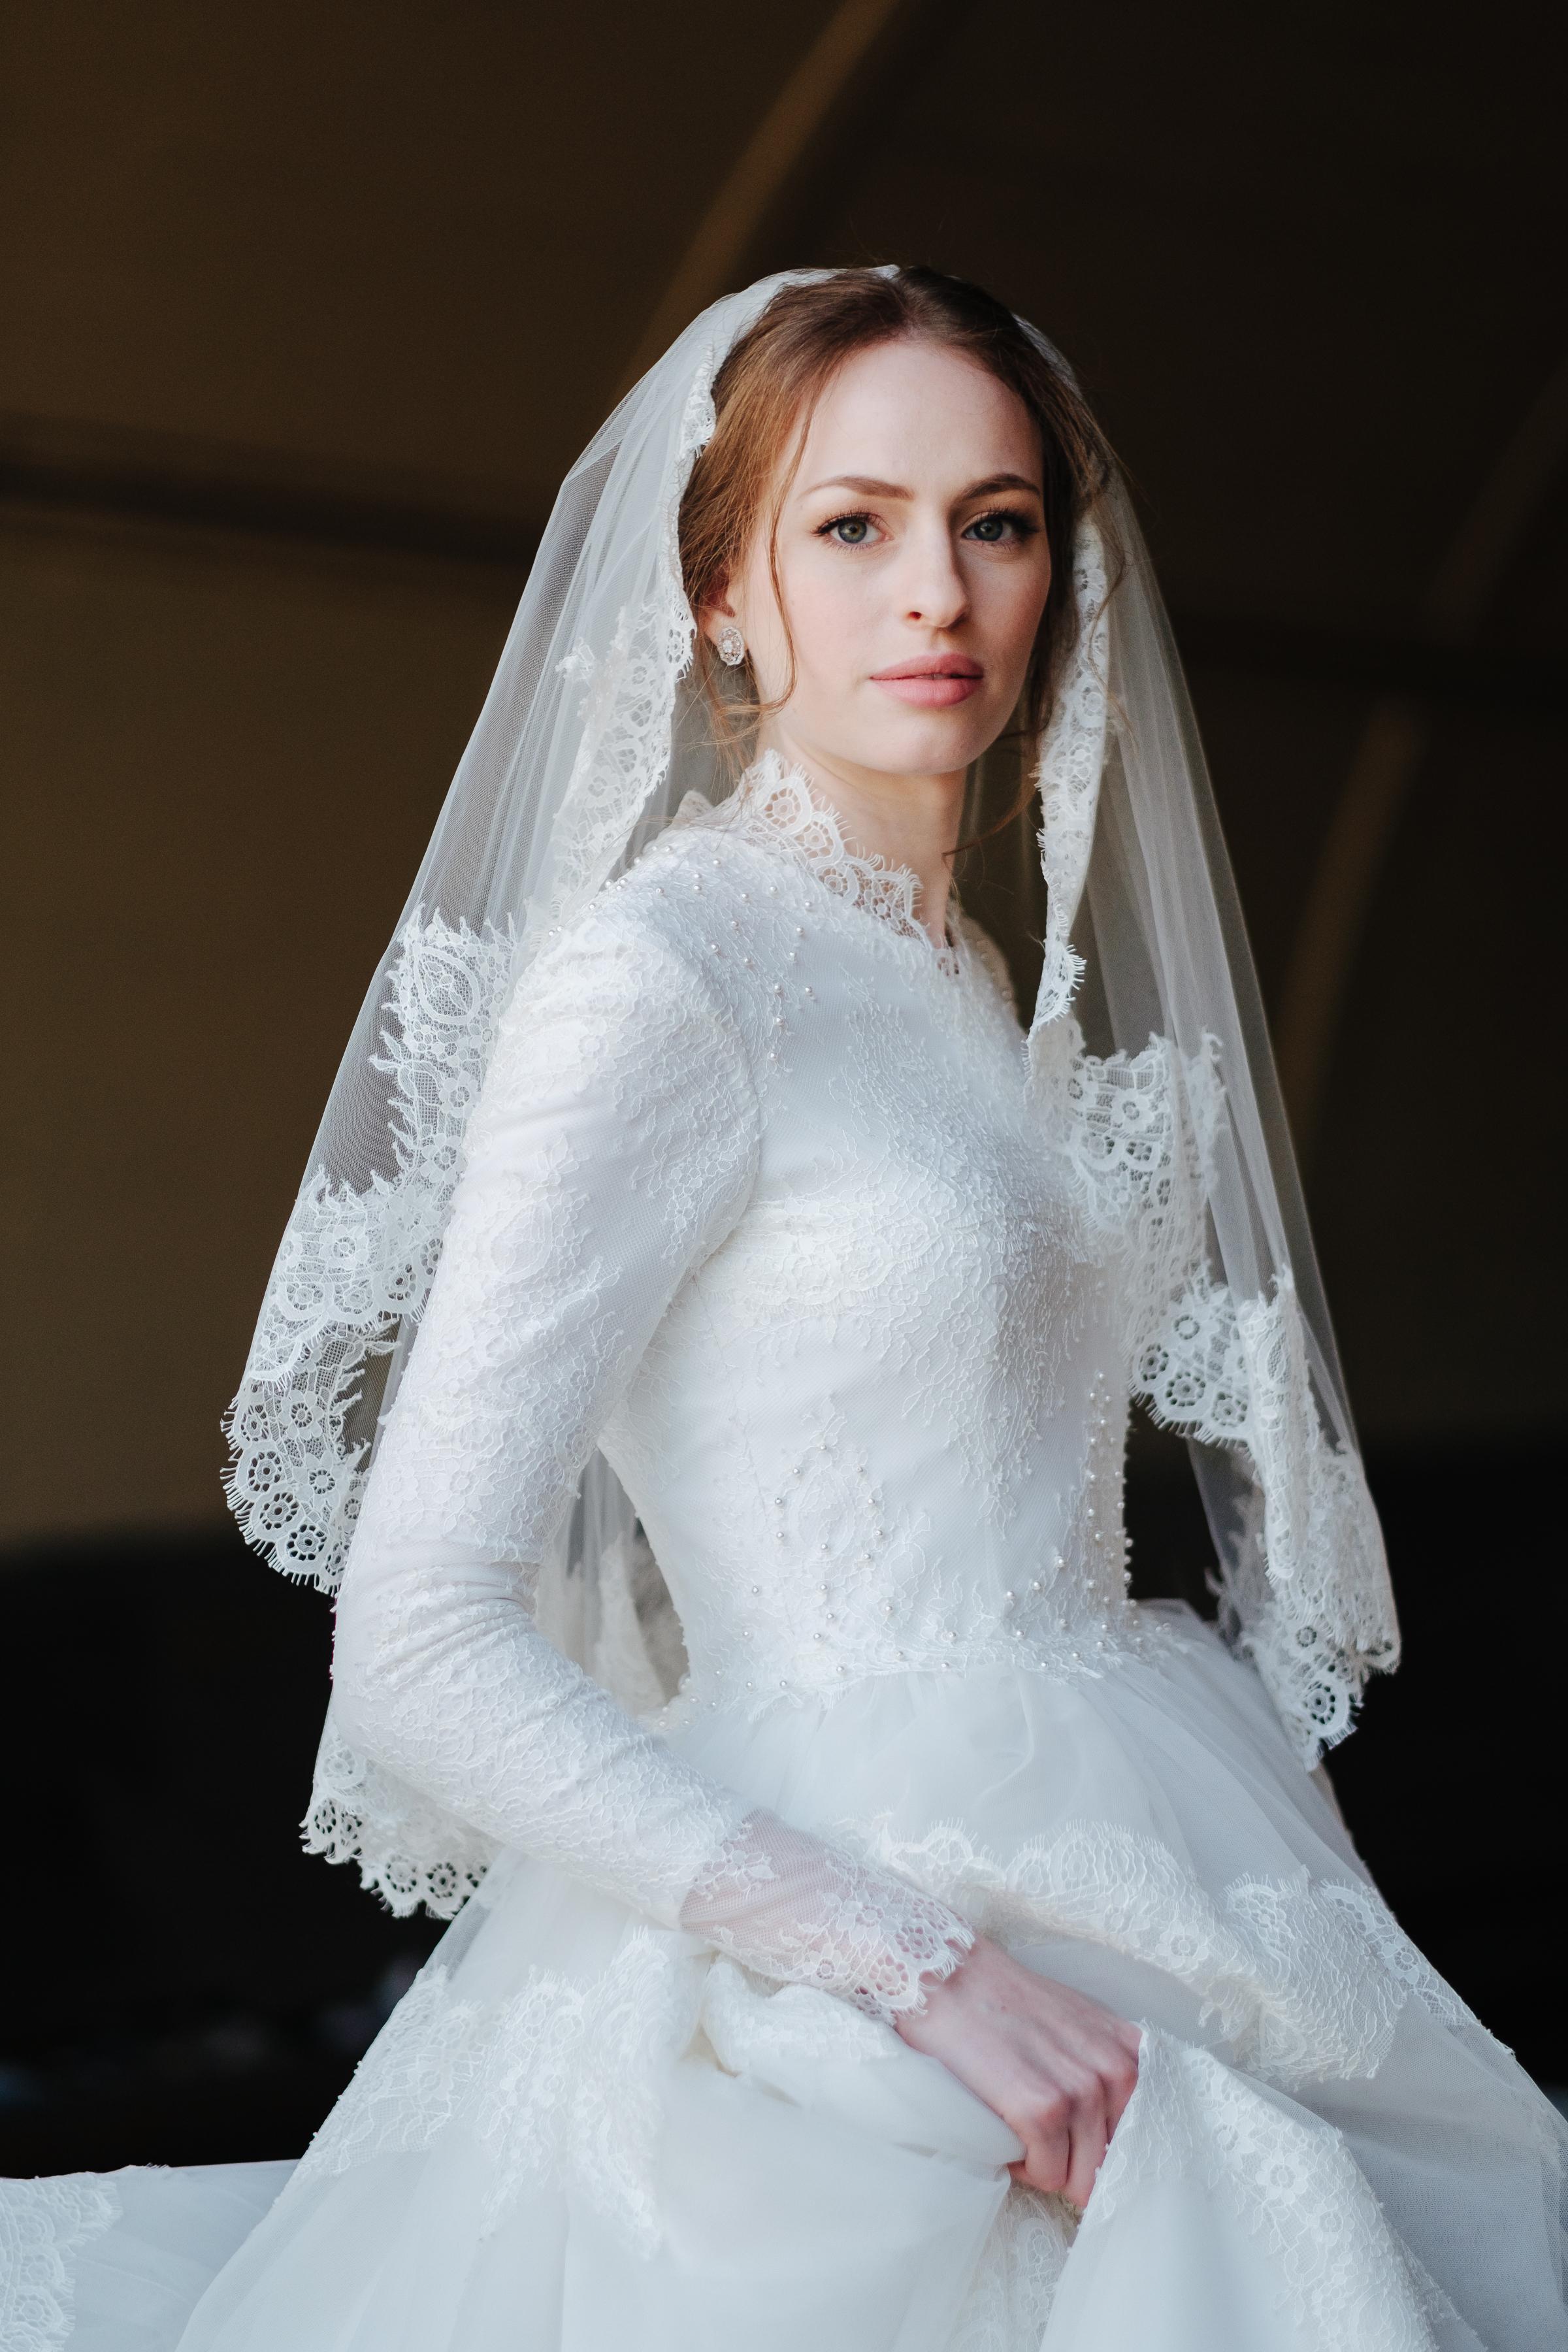 Wedding Moussie & Menachem - Eliau Piha studio photography-0206.jpg